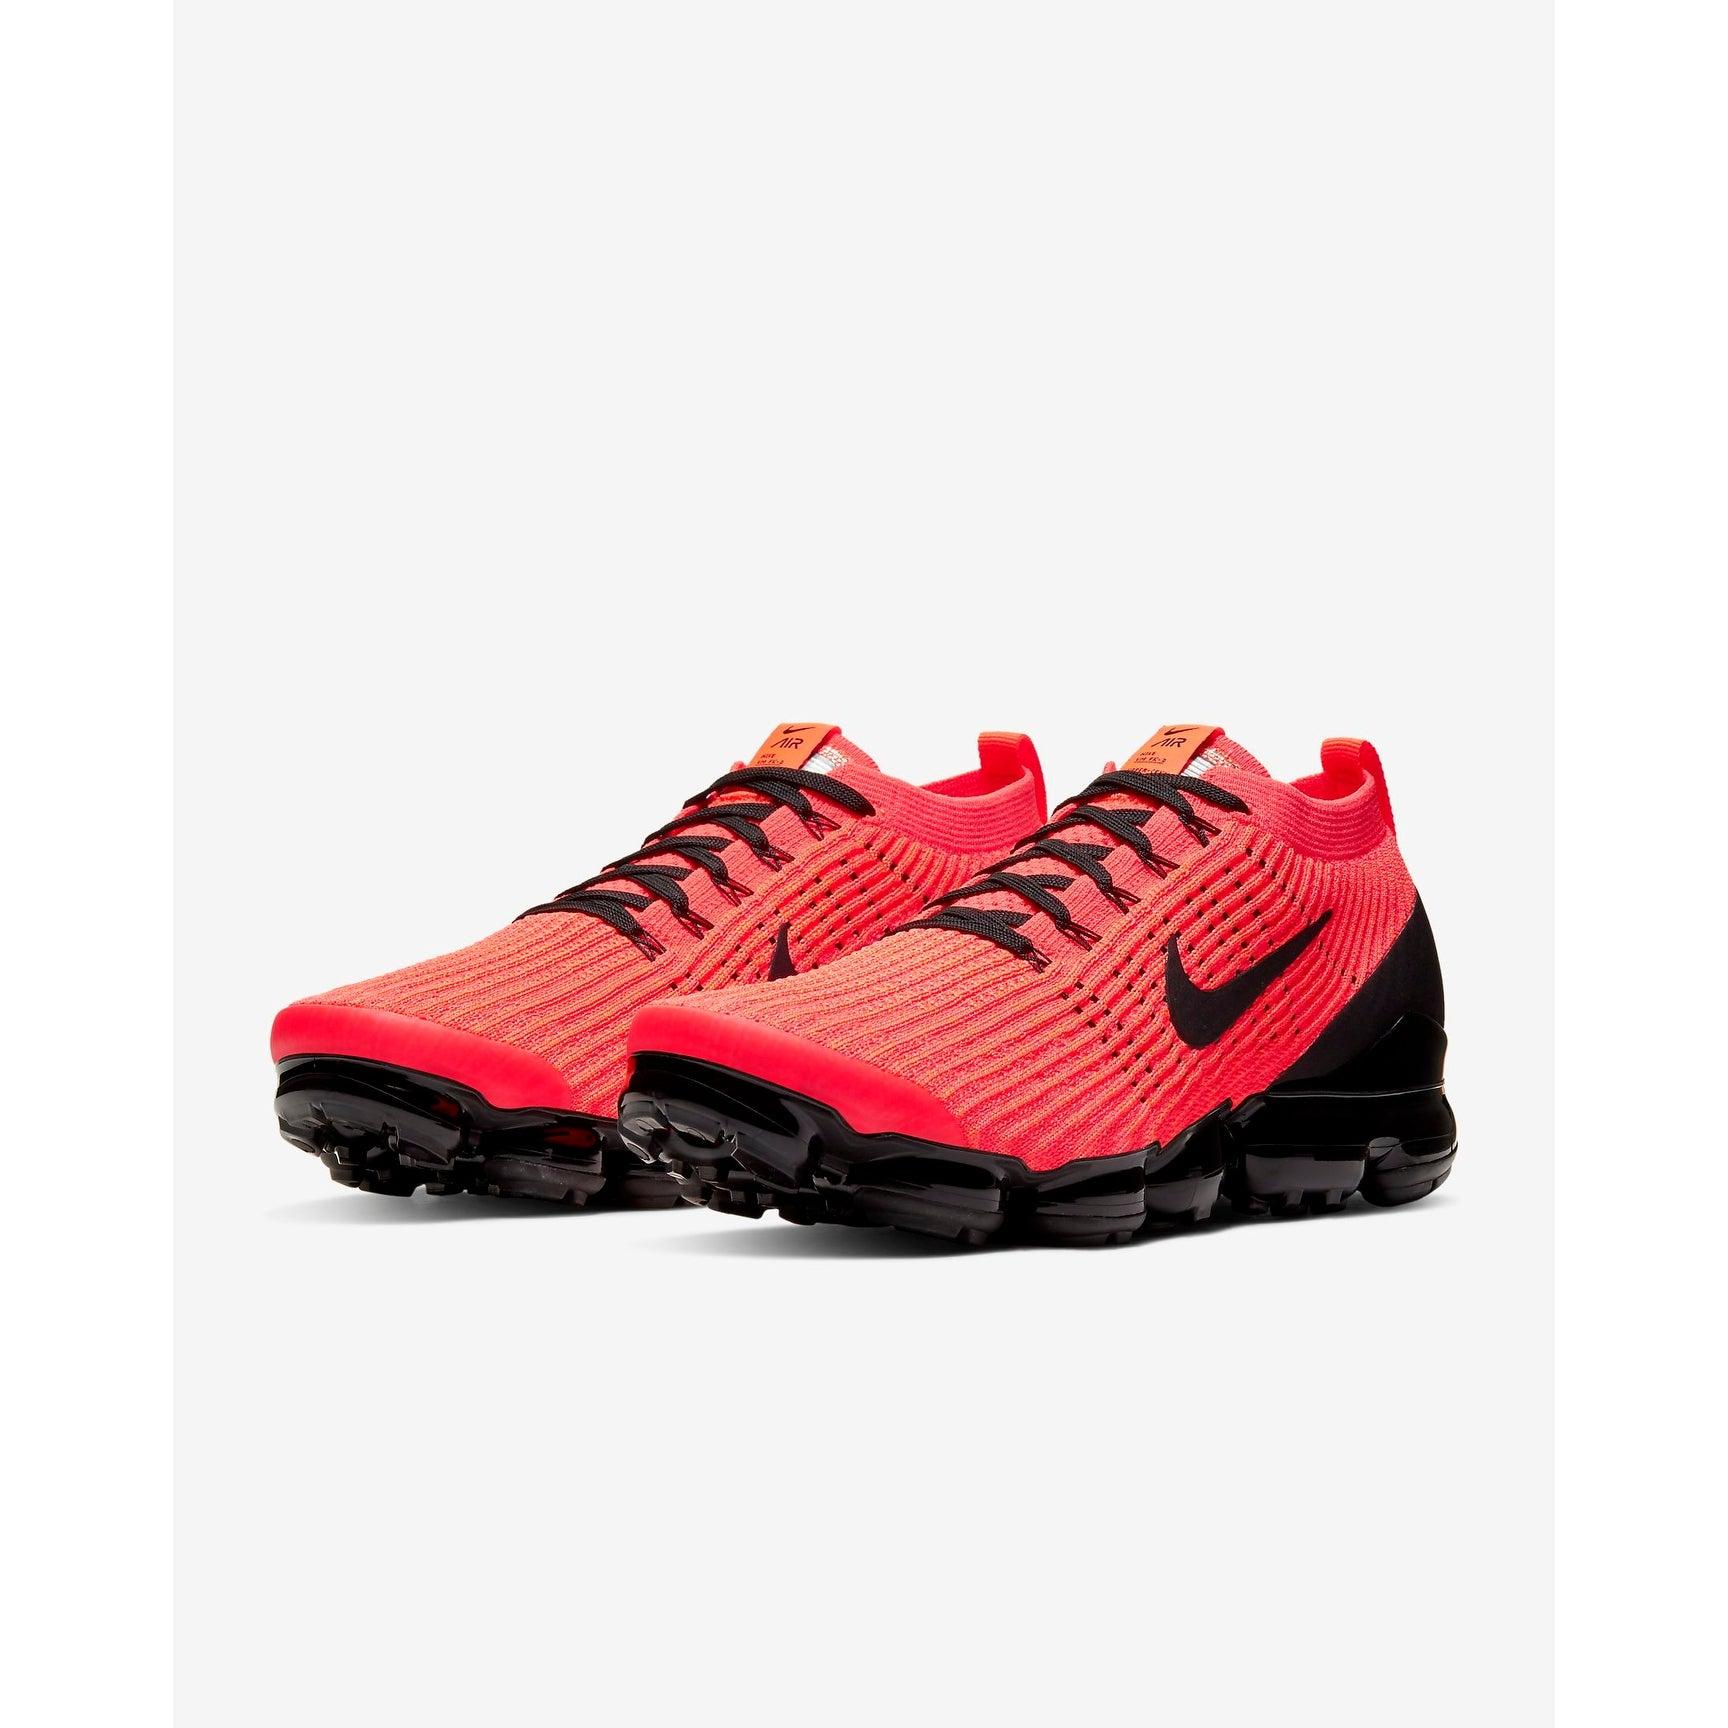 nike air vapormax flyknit 3 men's shoe review